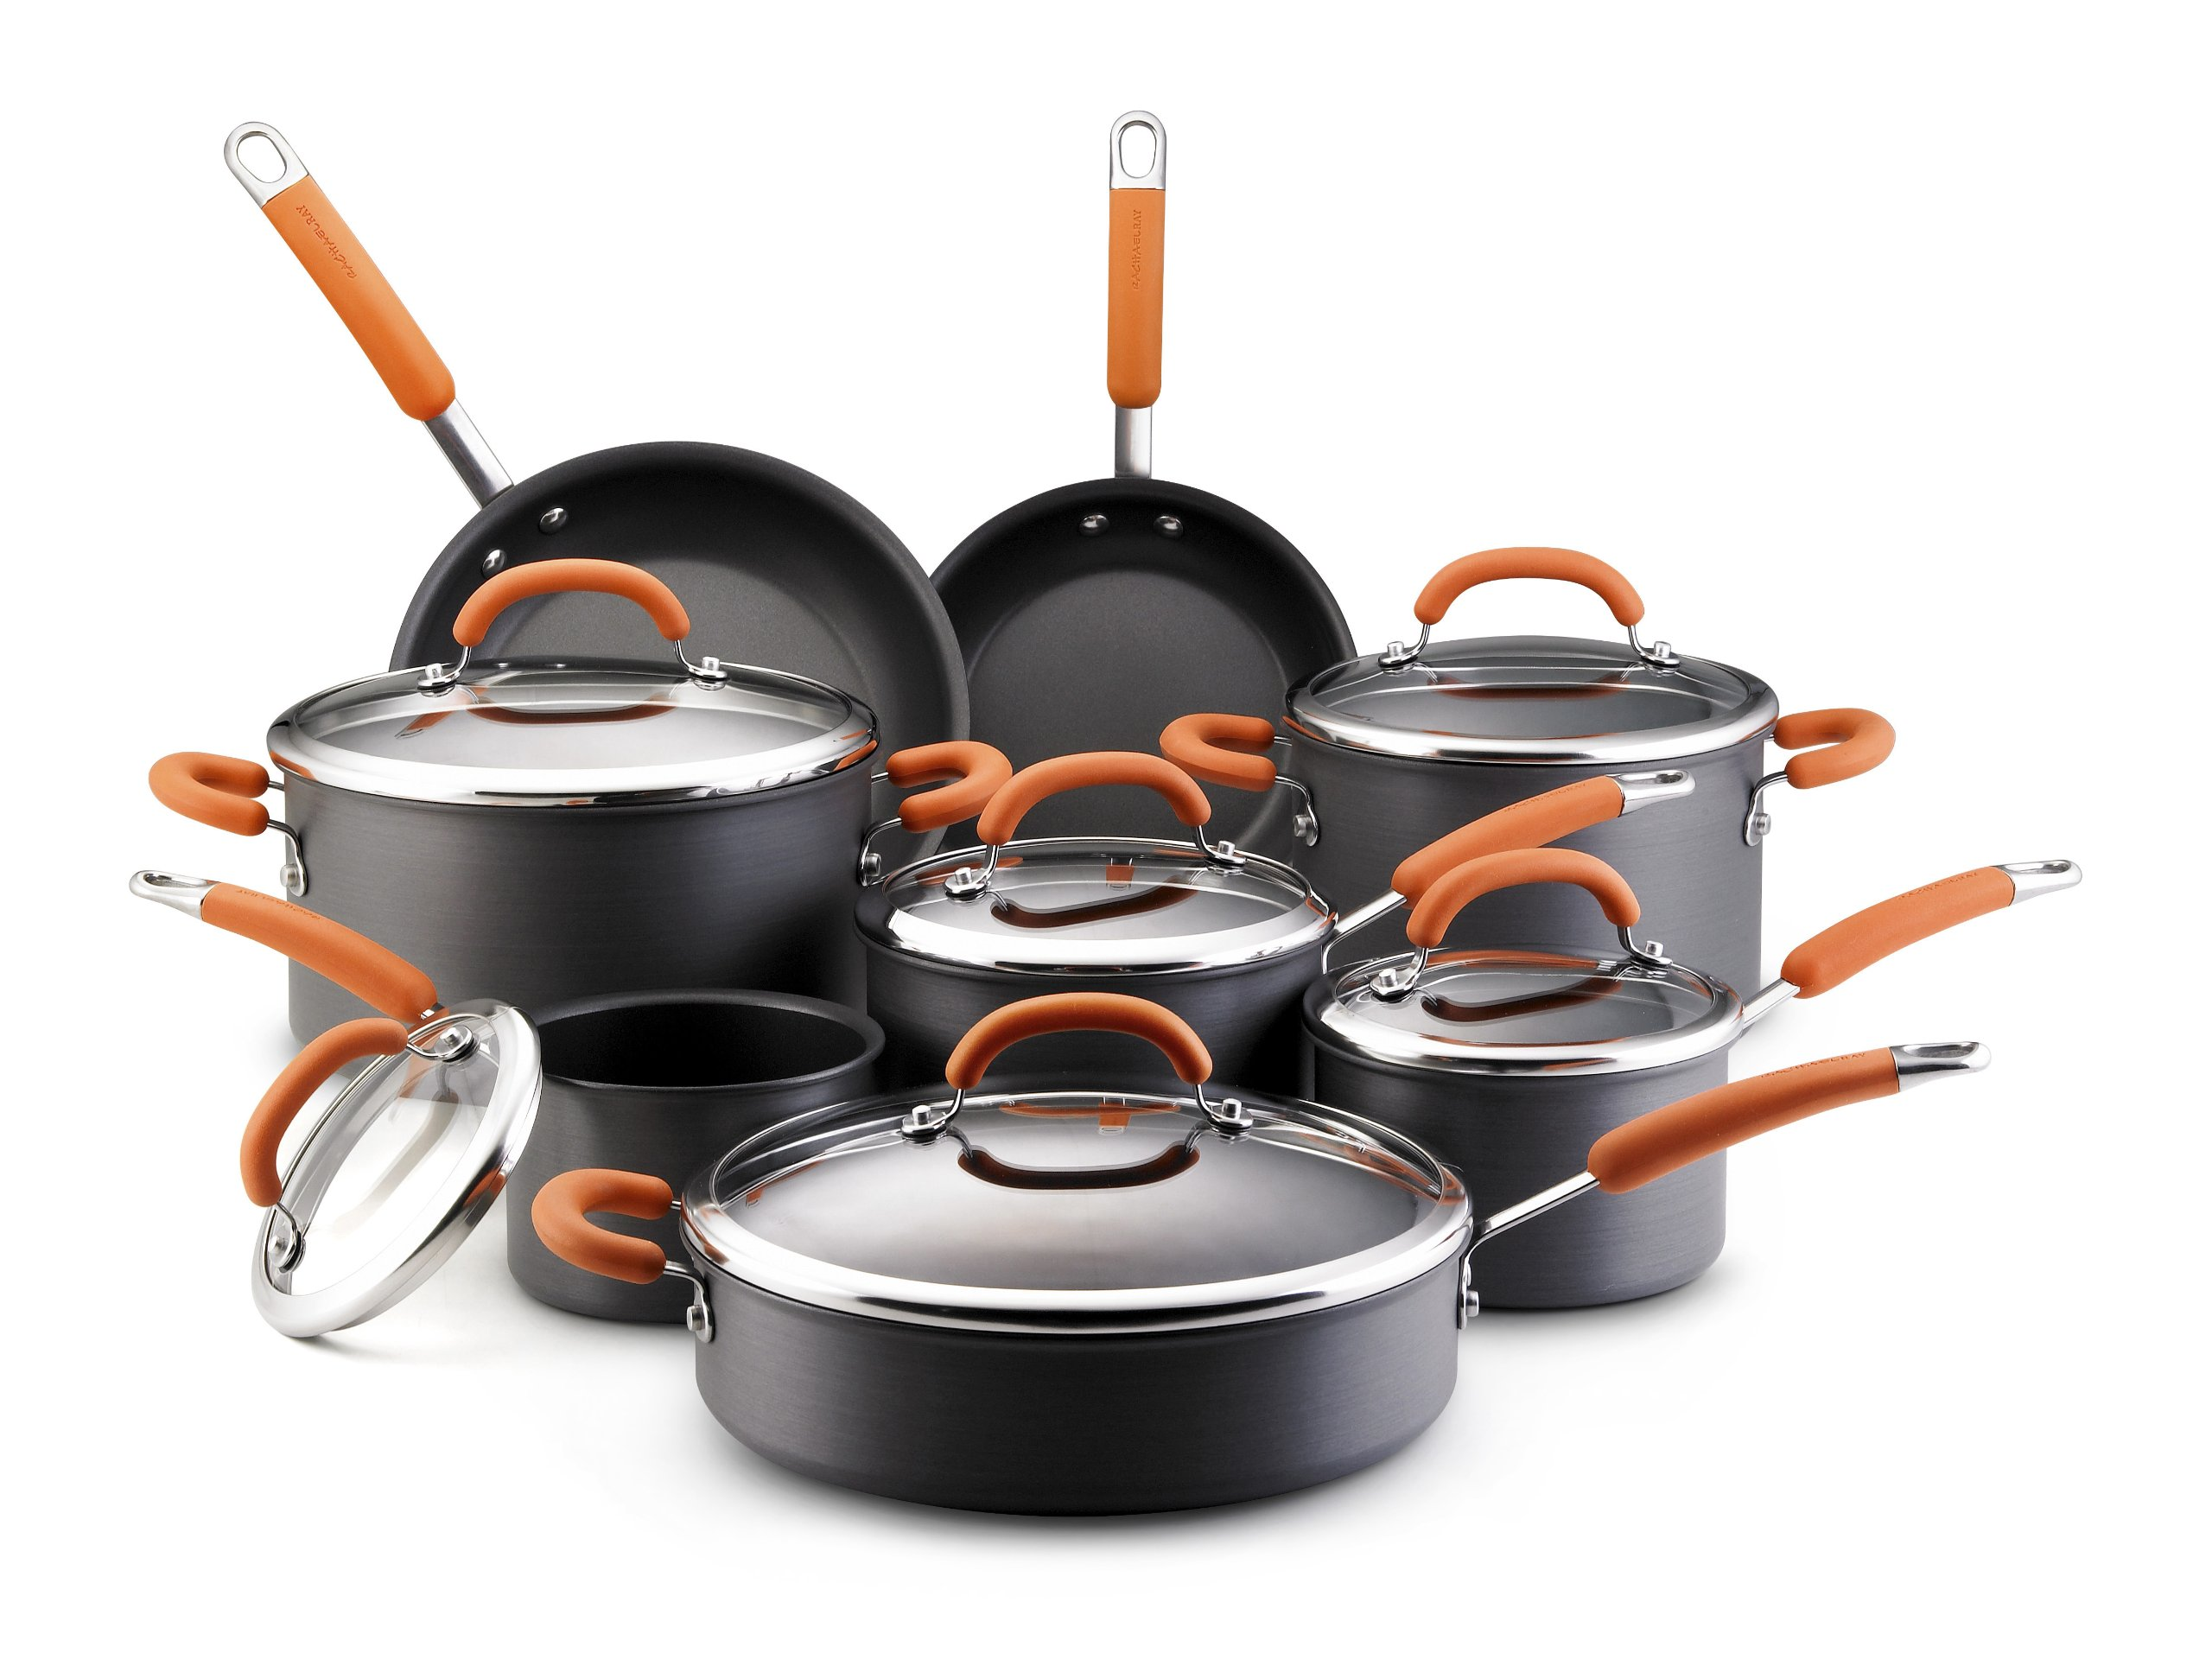 Rachael Ray Hard Anodized Nonstick 14-Piece Cookware Set, Orange